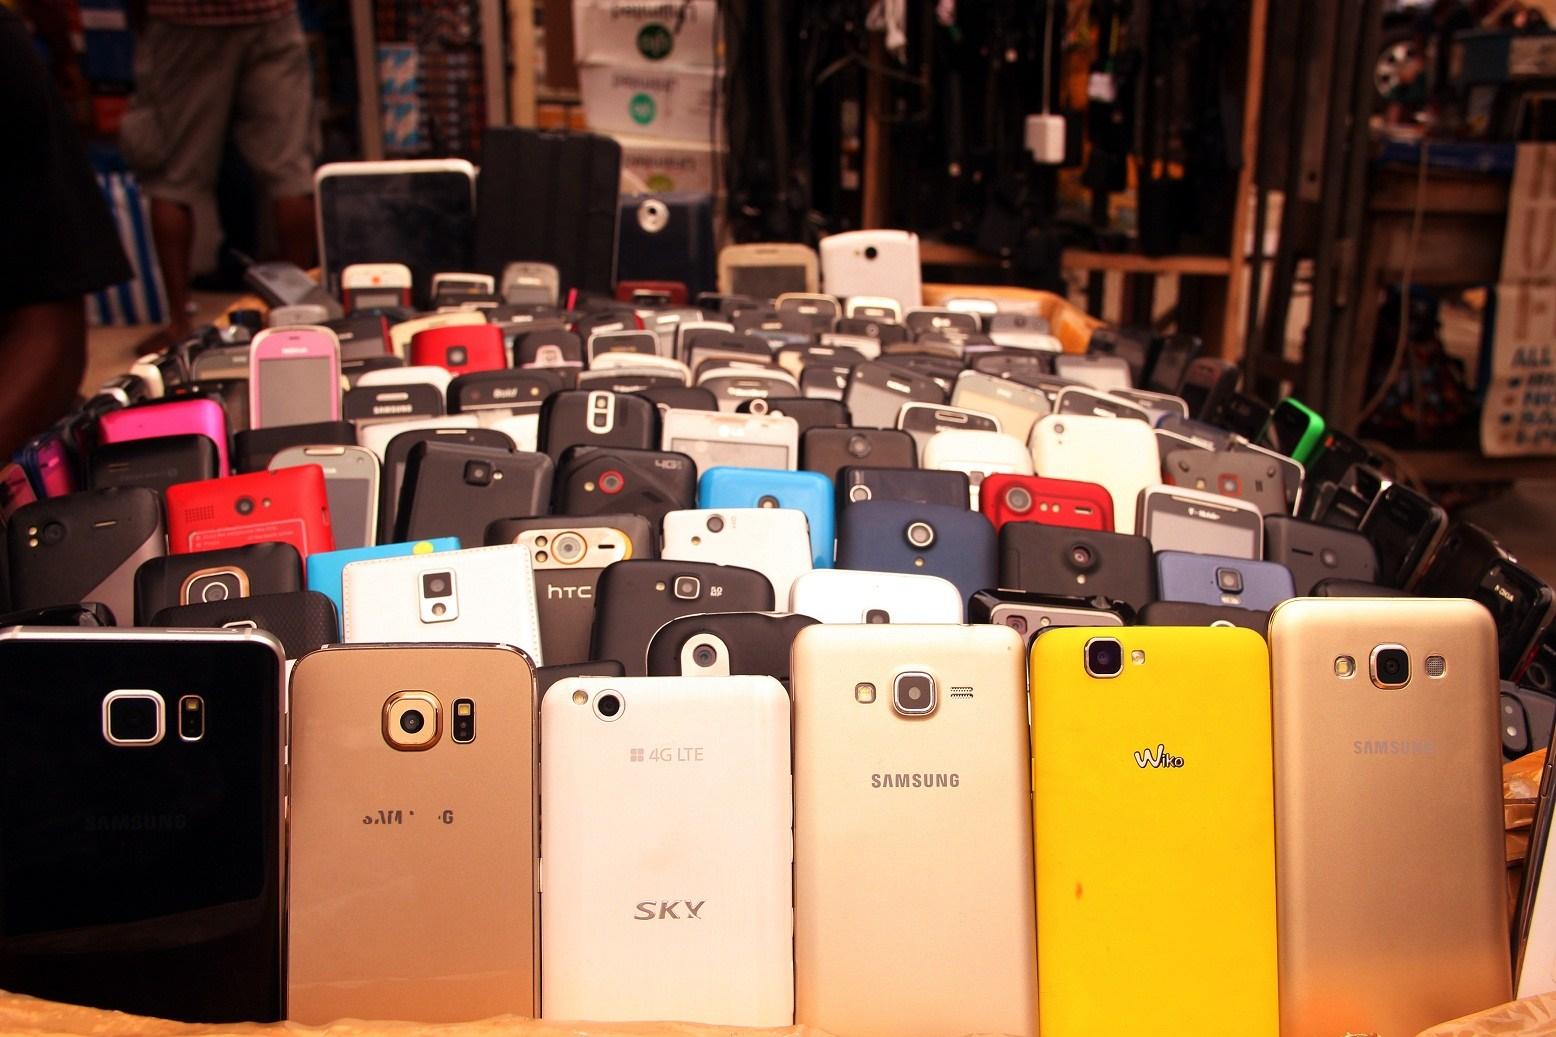 Man Steals N104,000 Phones with Rope in Lagos